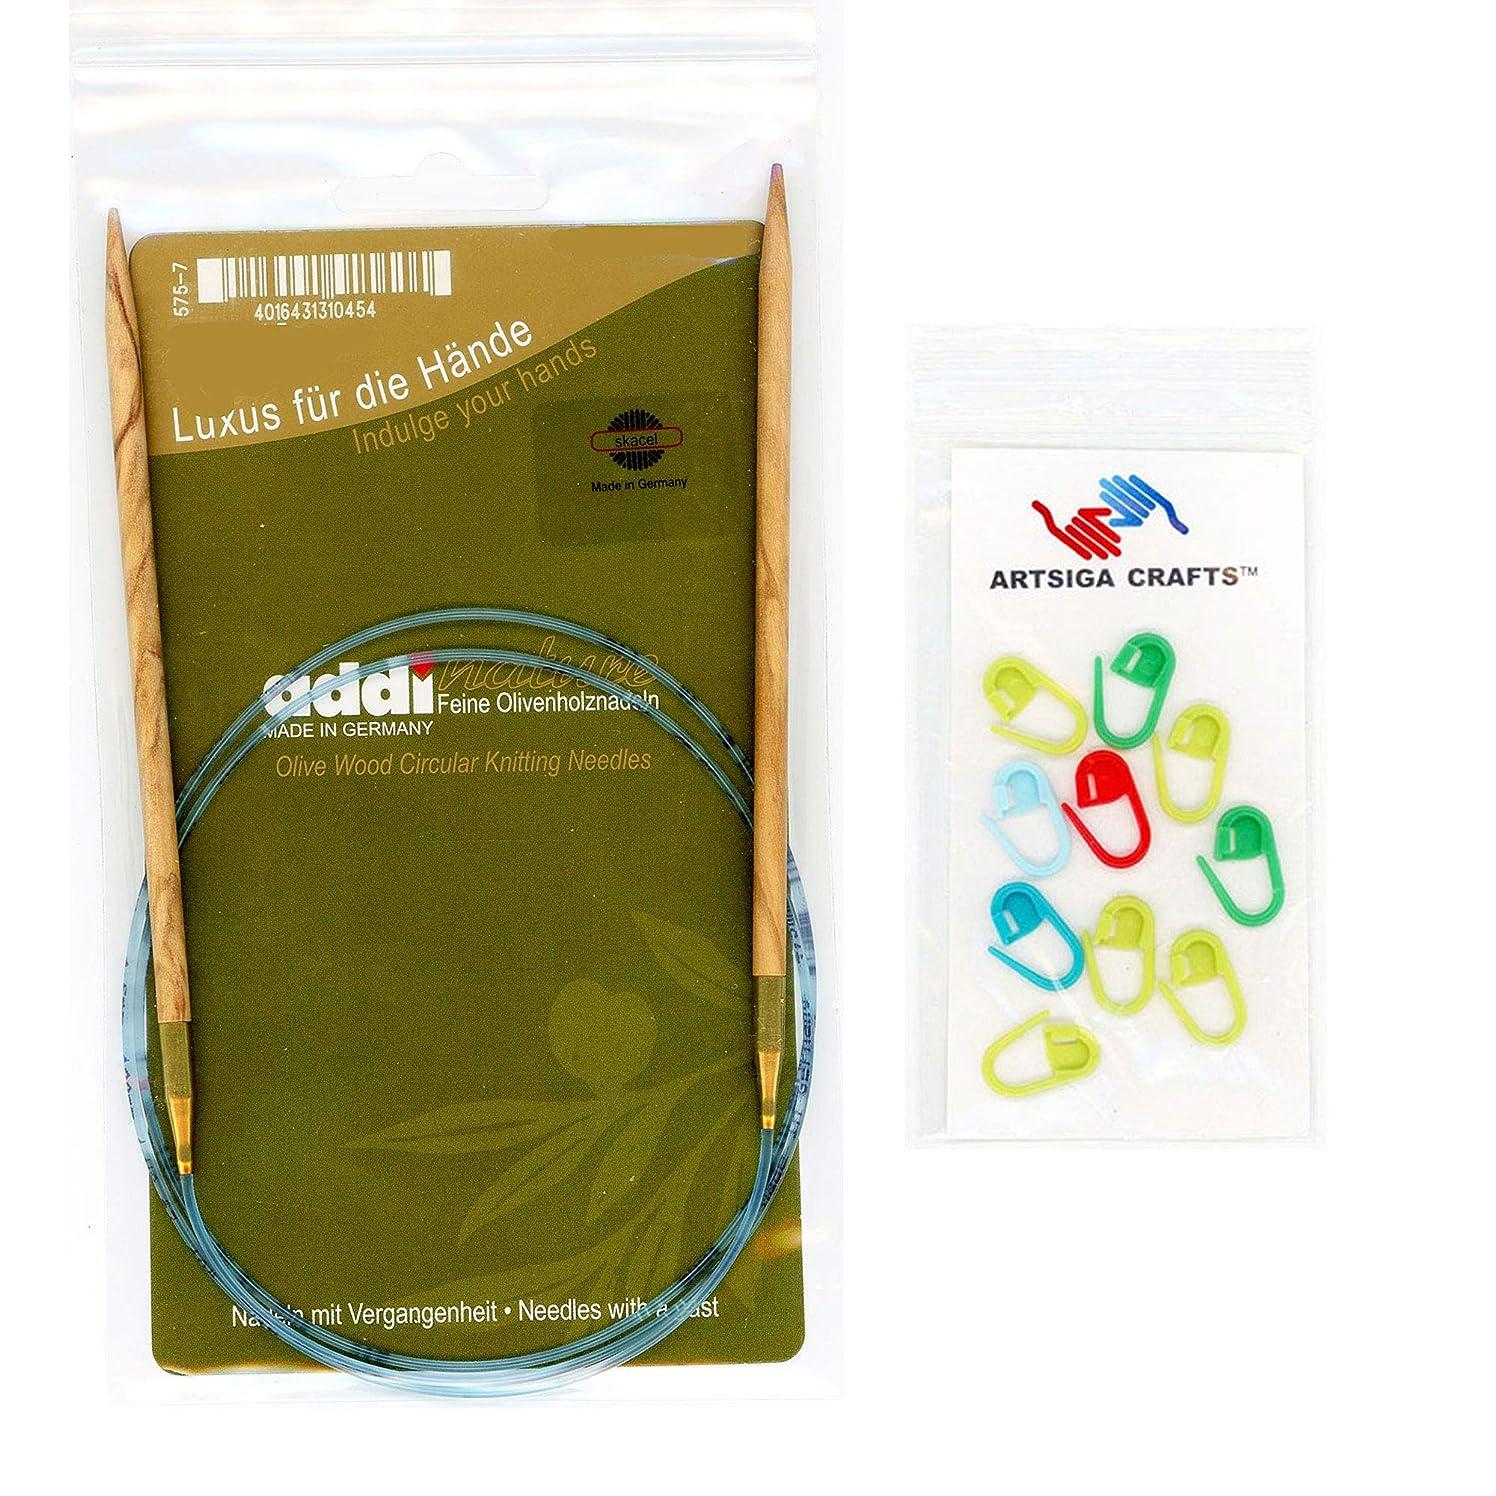 addi Knitting Needle Circular Olive Wood Skacel Exclusive Blue Cord 40 inch (100cm) Size US 05 (3.75mm) Bundle with 10 Artsiga Crafts Stitch Markers